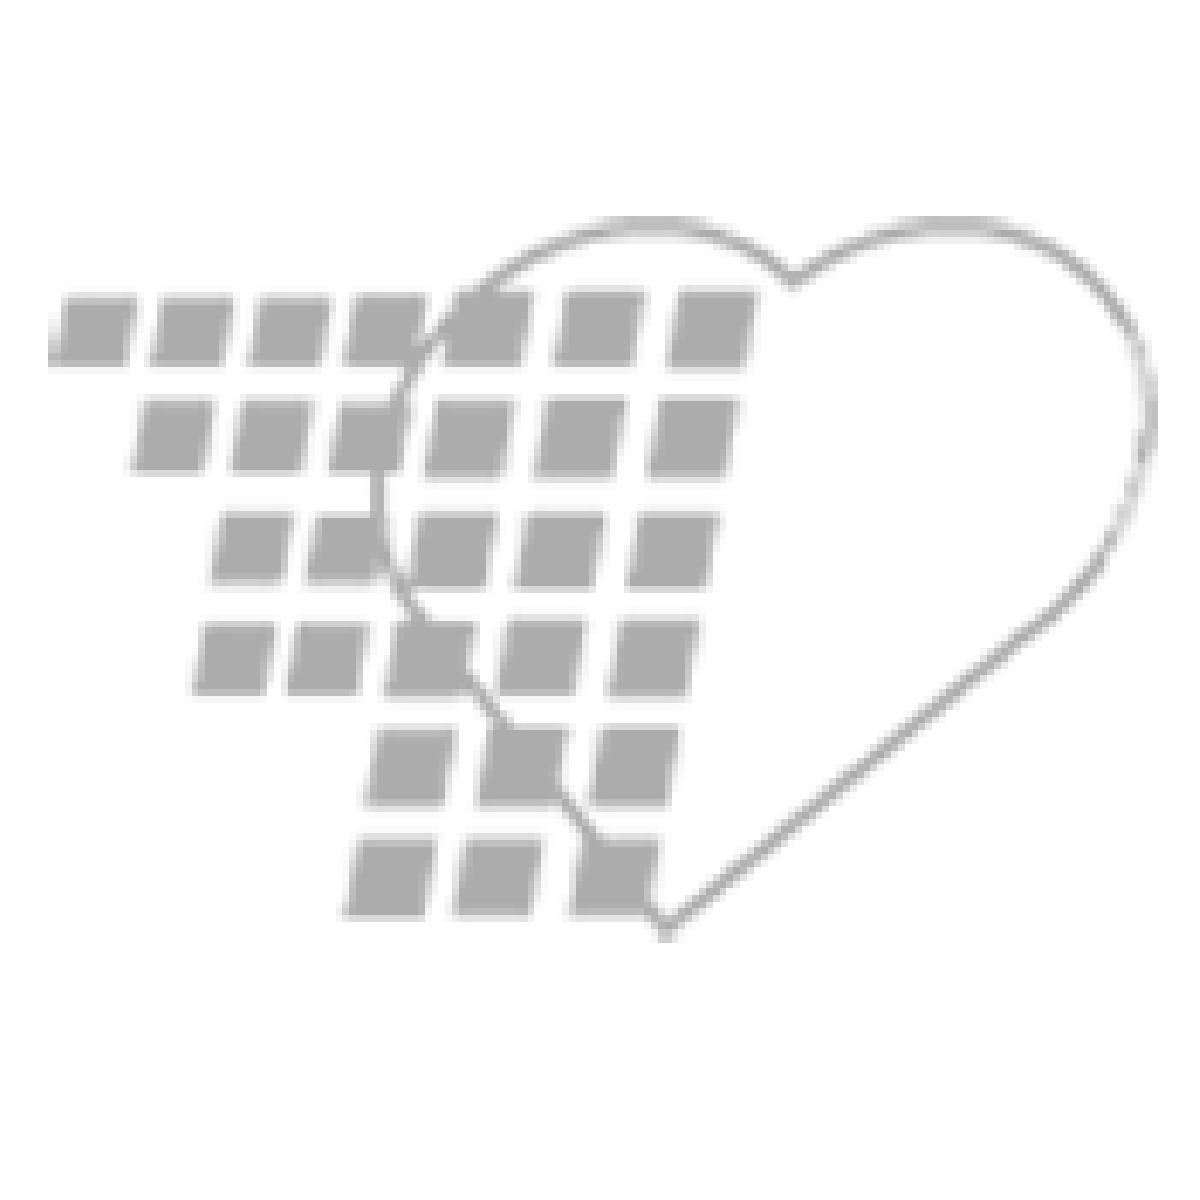 02-38-0953 - Accu-Chek Softclix Lancets